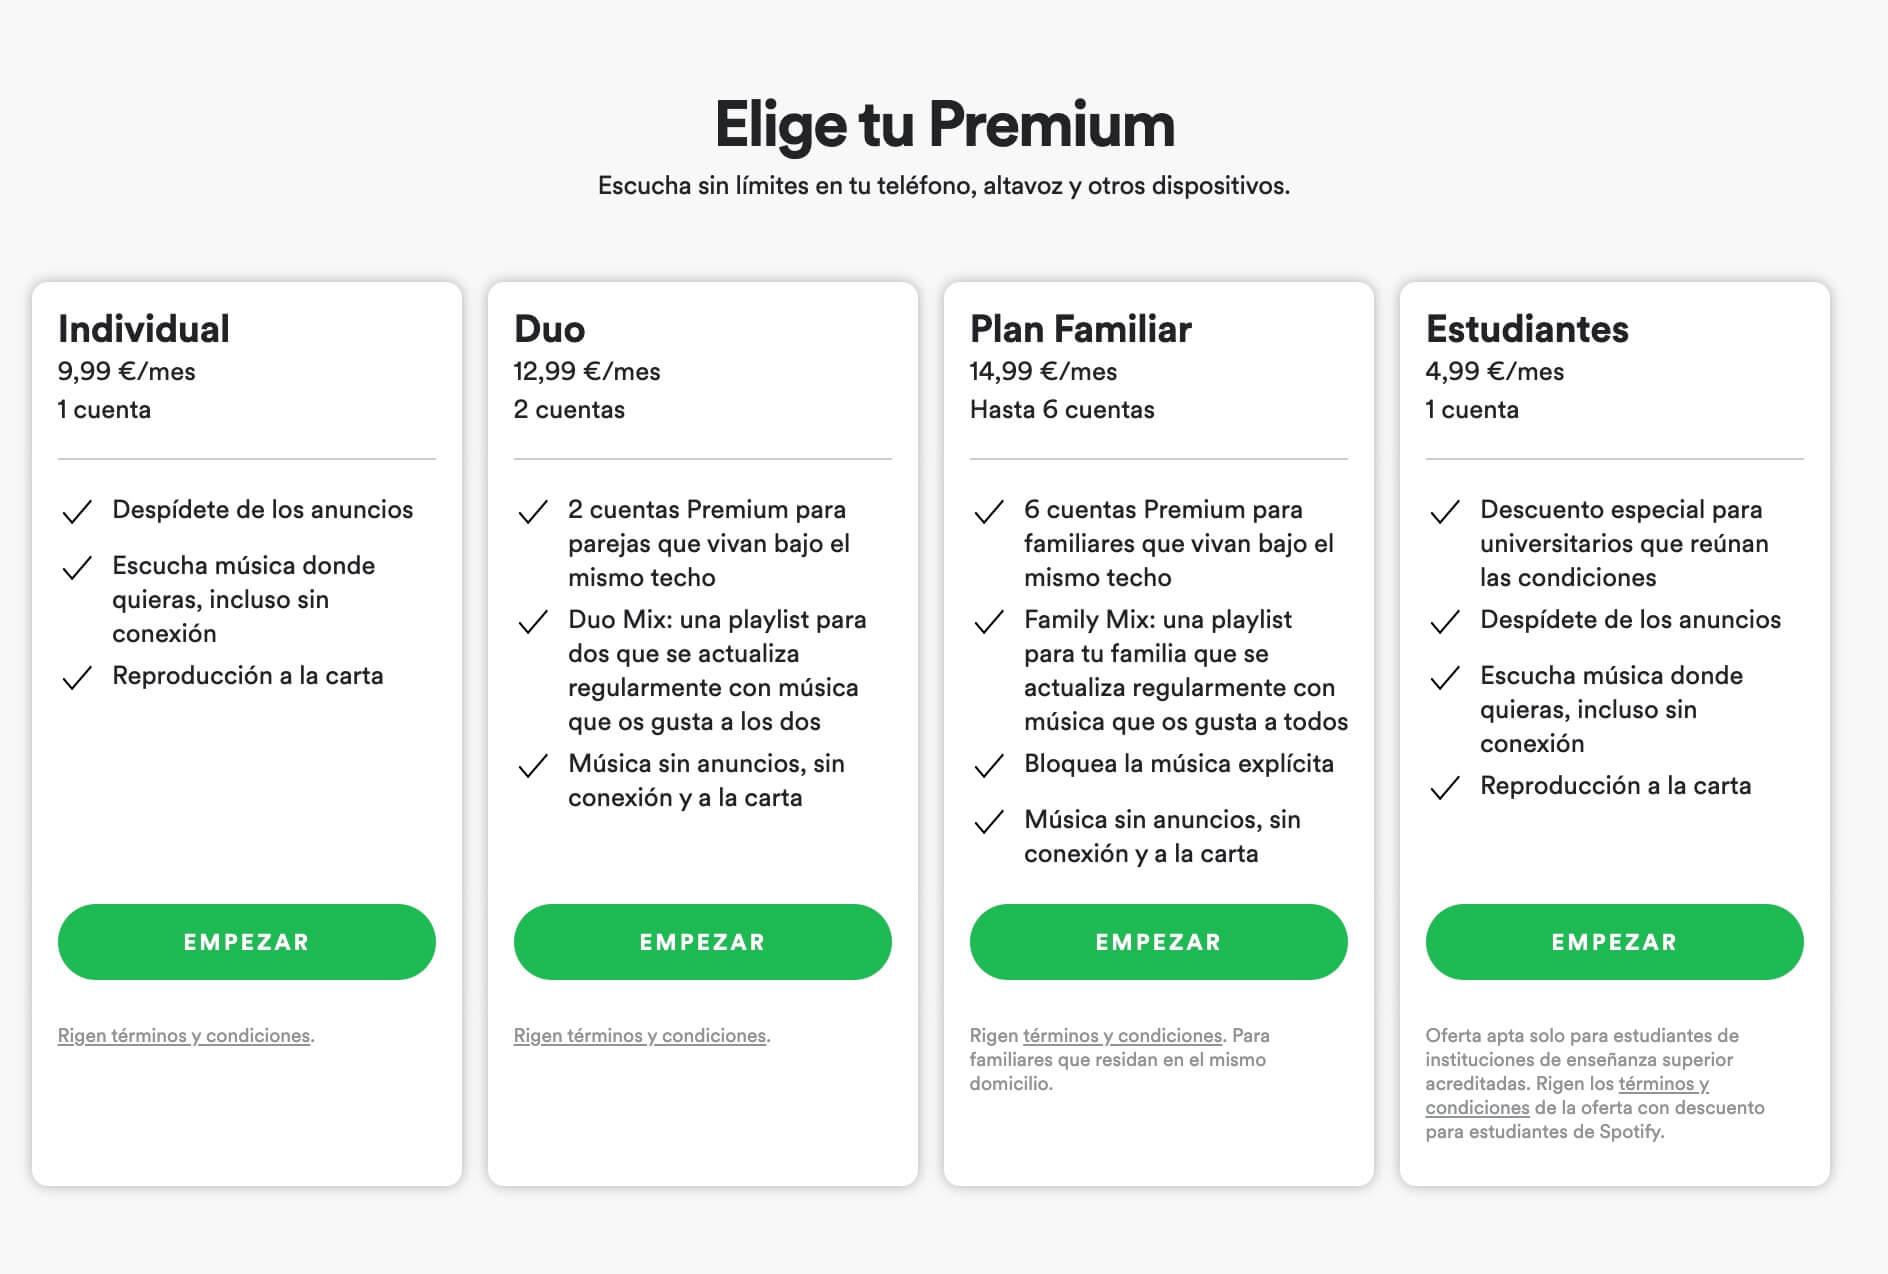 Ejemplo de modelo freemium B2C de Spotify